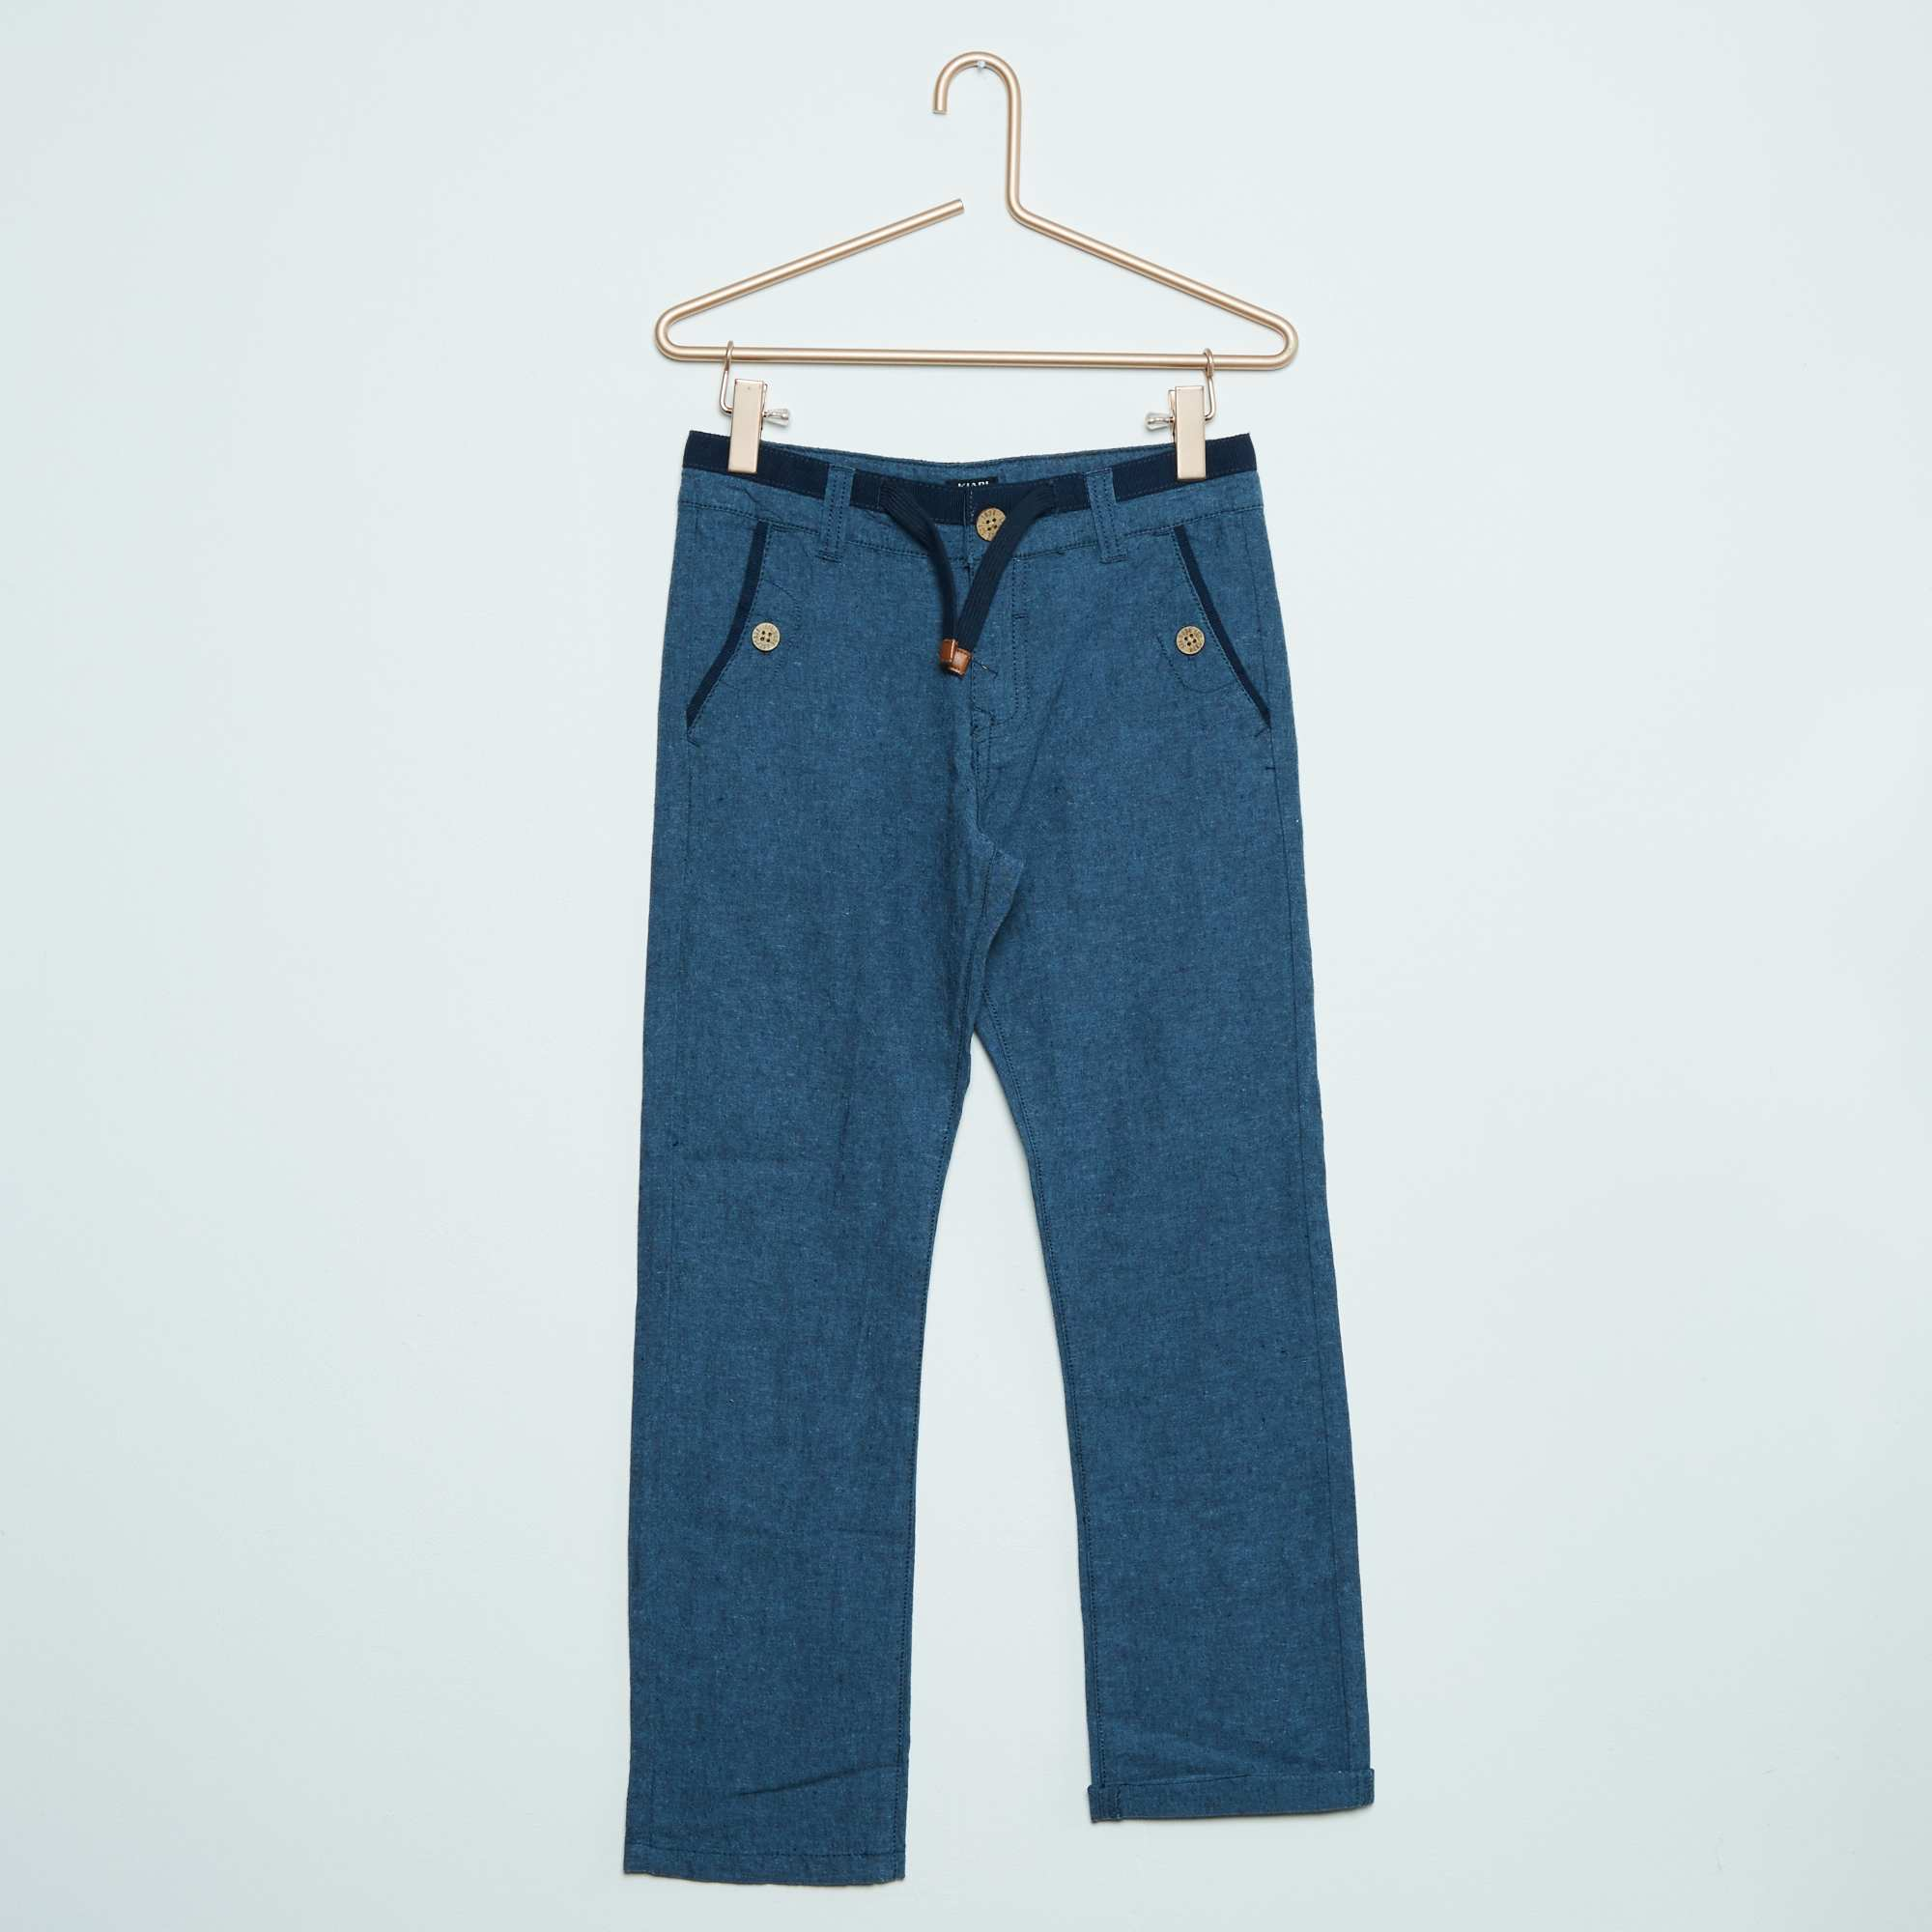 pantalon en coton et lin gar on kiabi 15 00. Black Bedroom Furniture Sets. Home Design Ideas